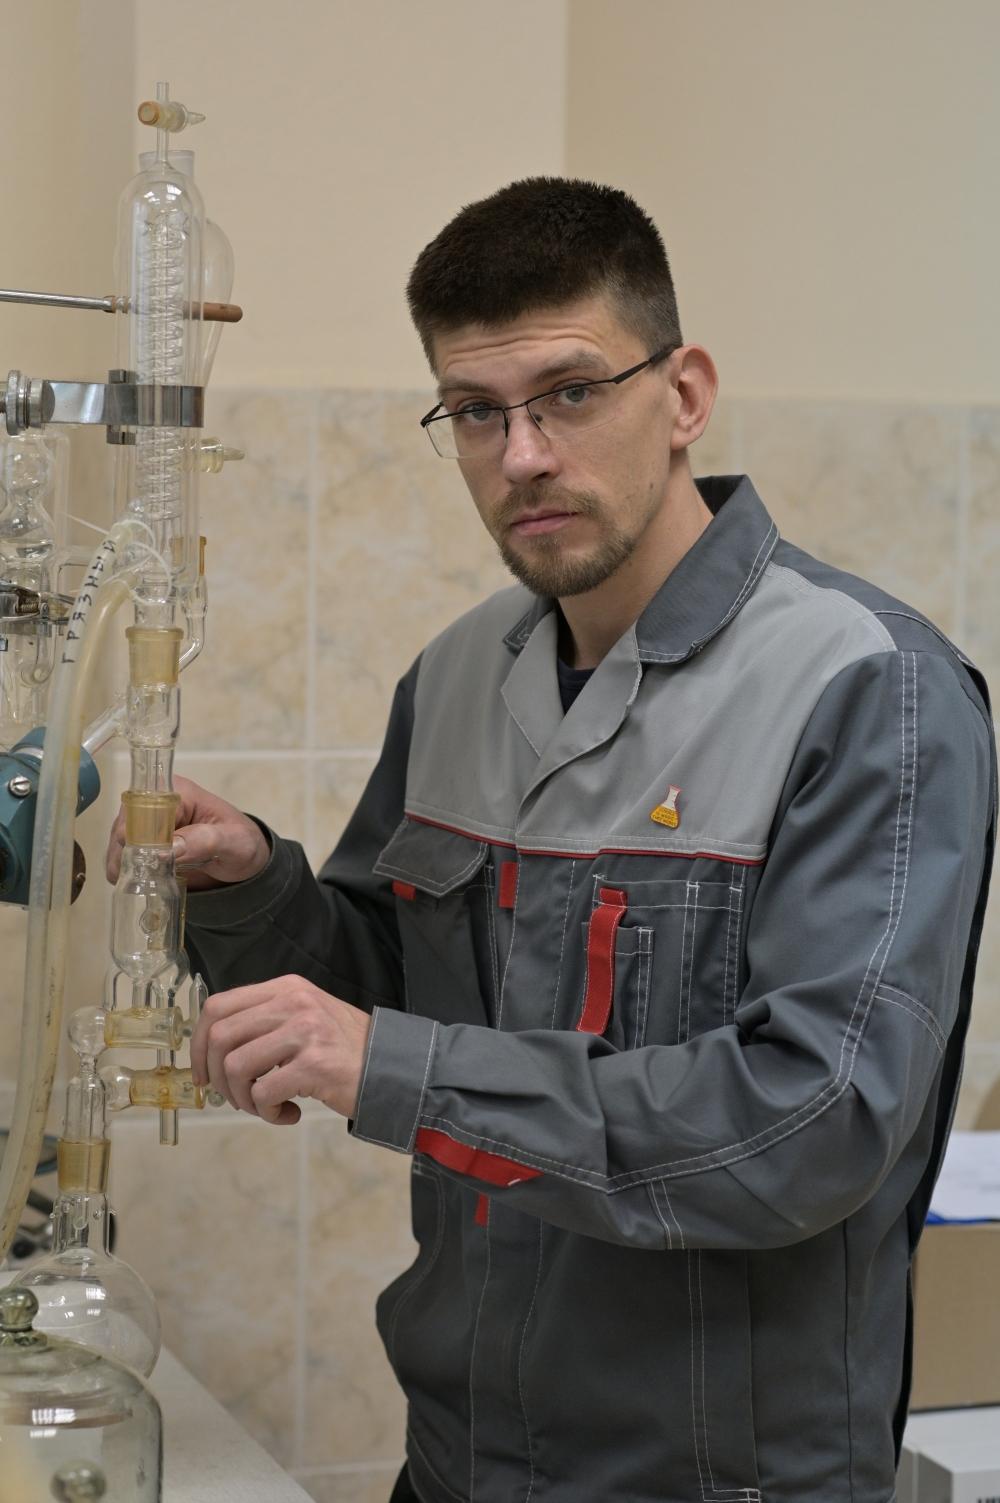 Старший научный сотрудник, к. х. н. Роман Мироненко.